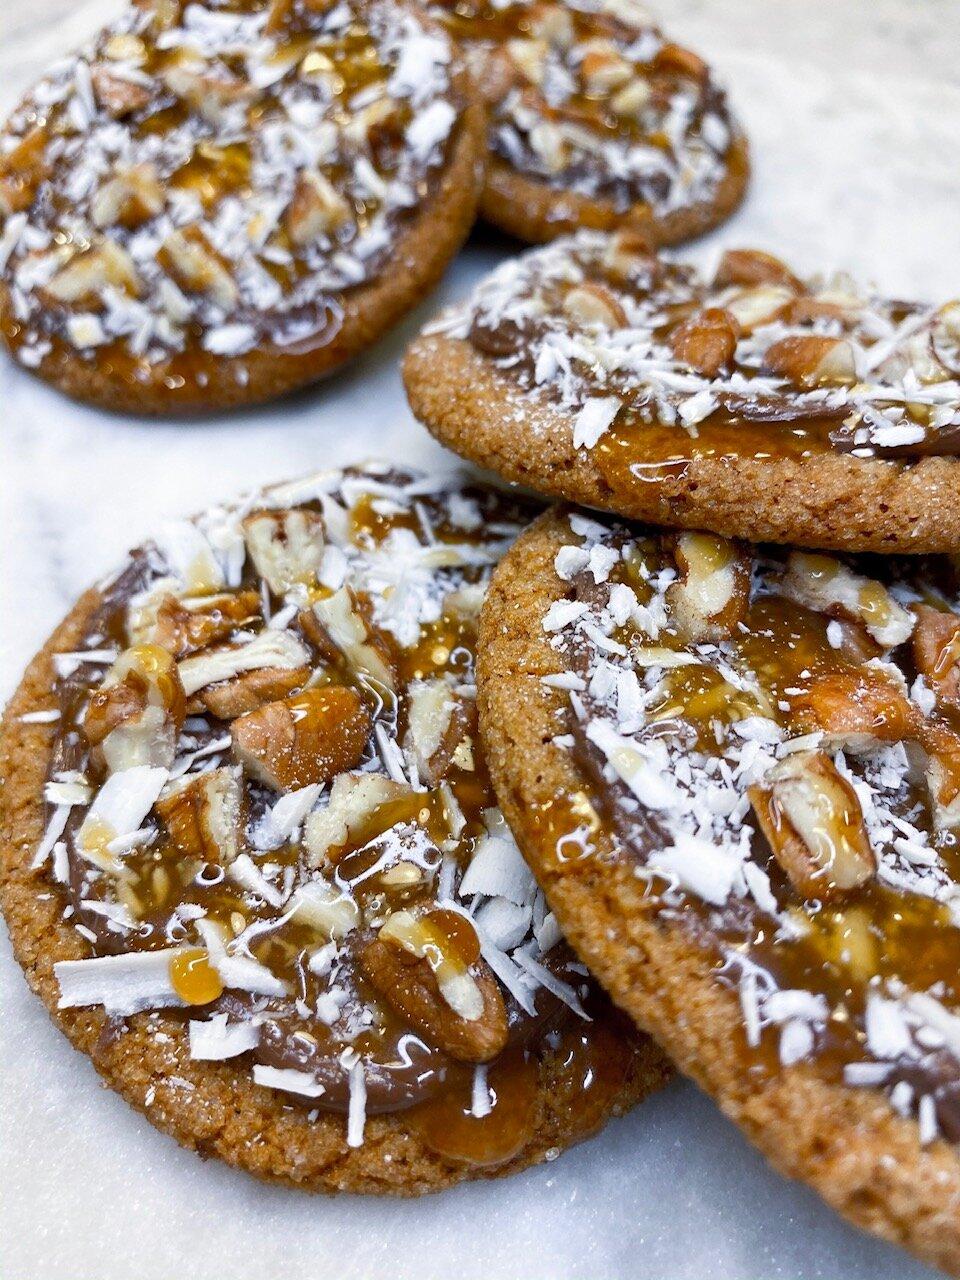 Nutella+Caramel+Gingerbread+Cookies